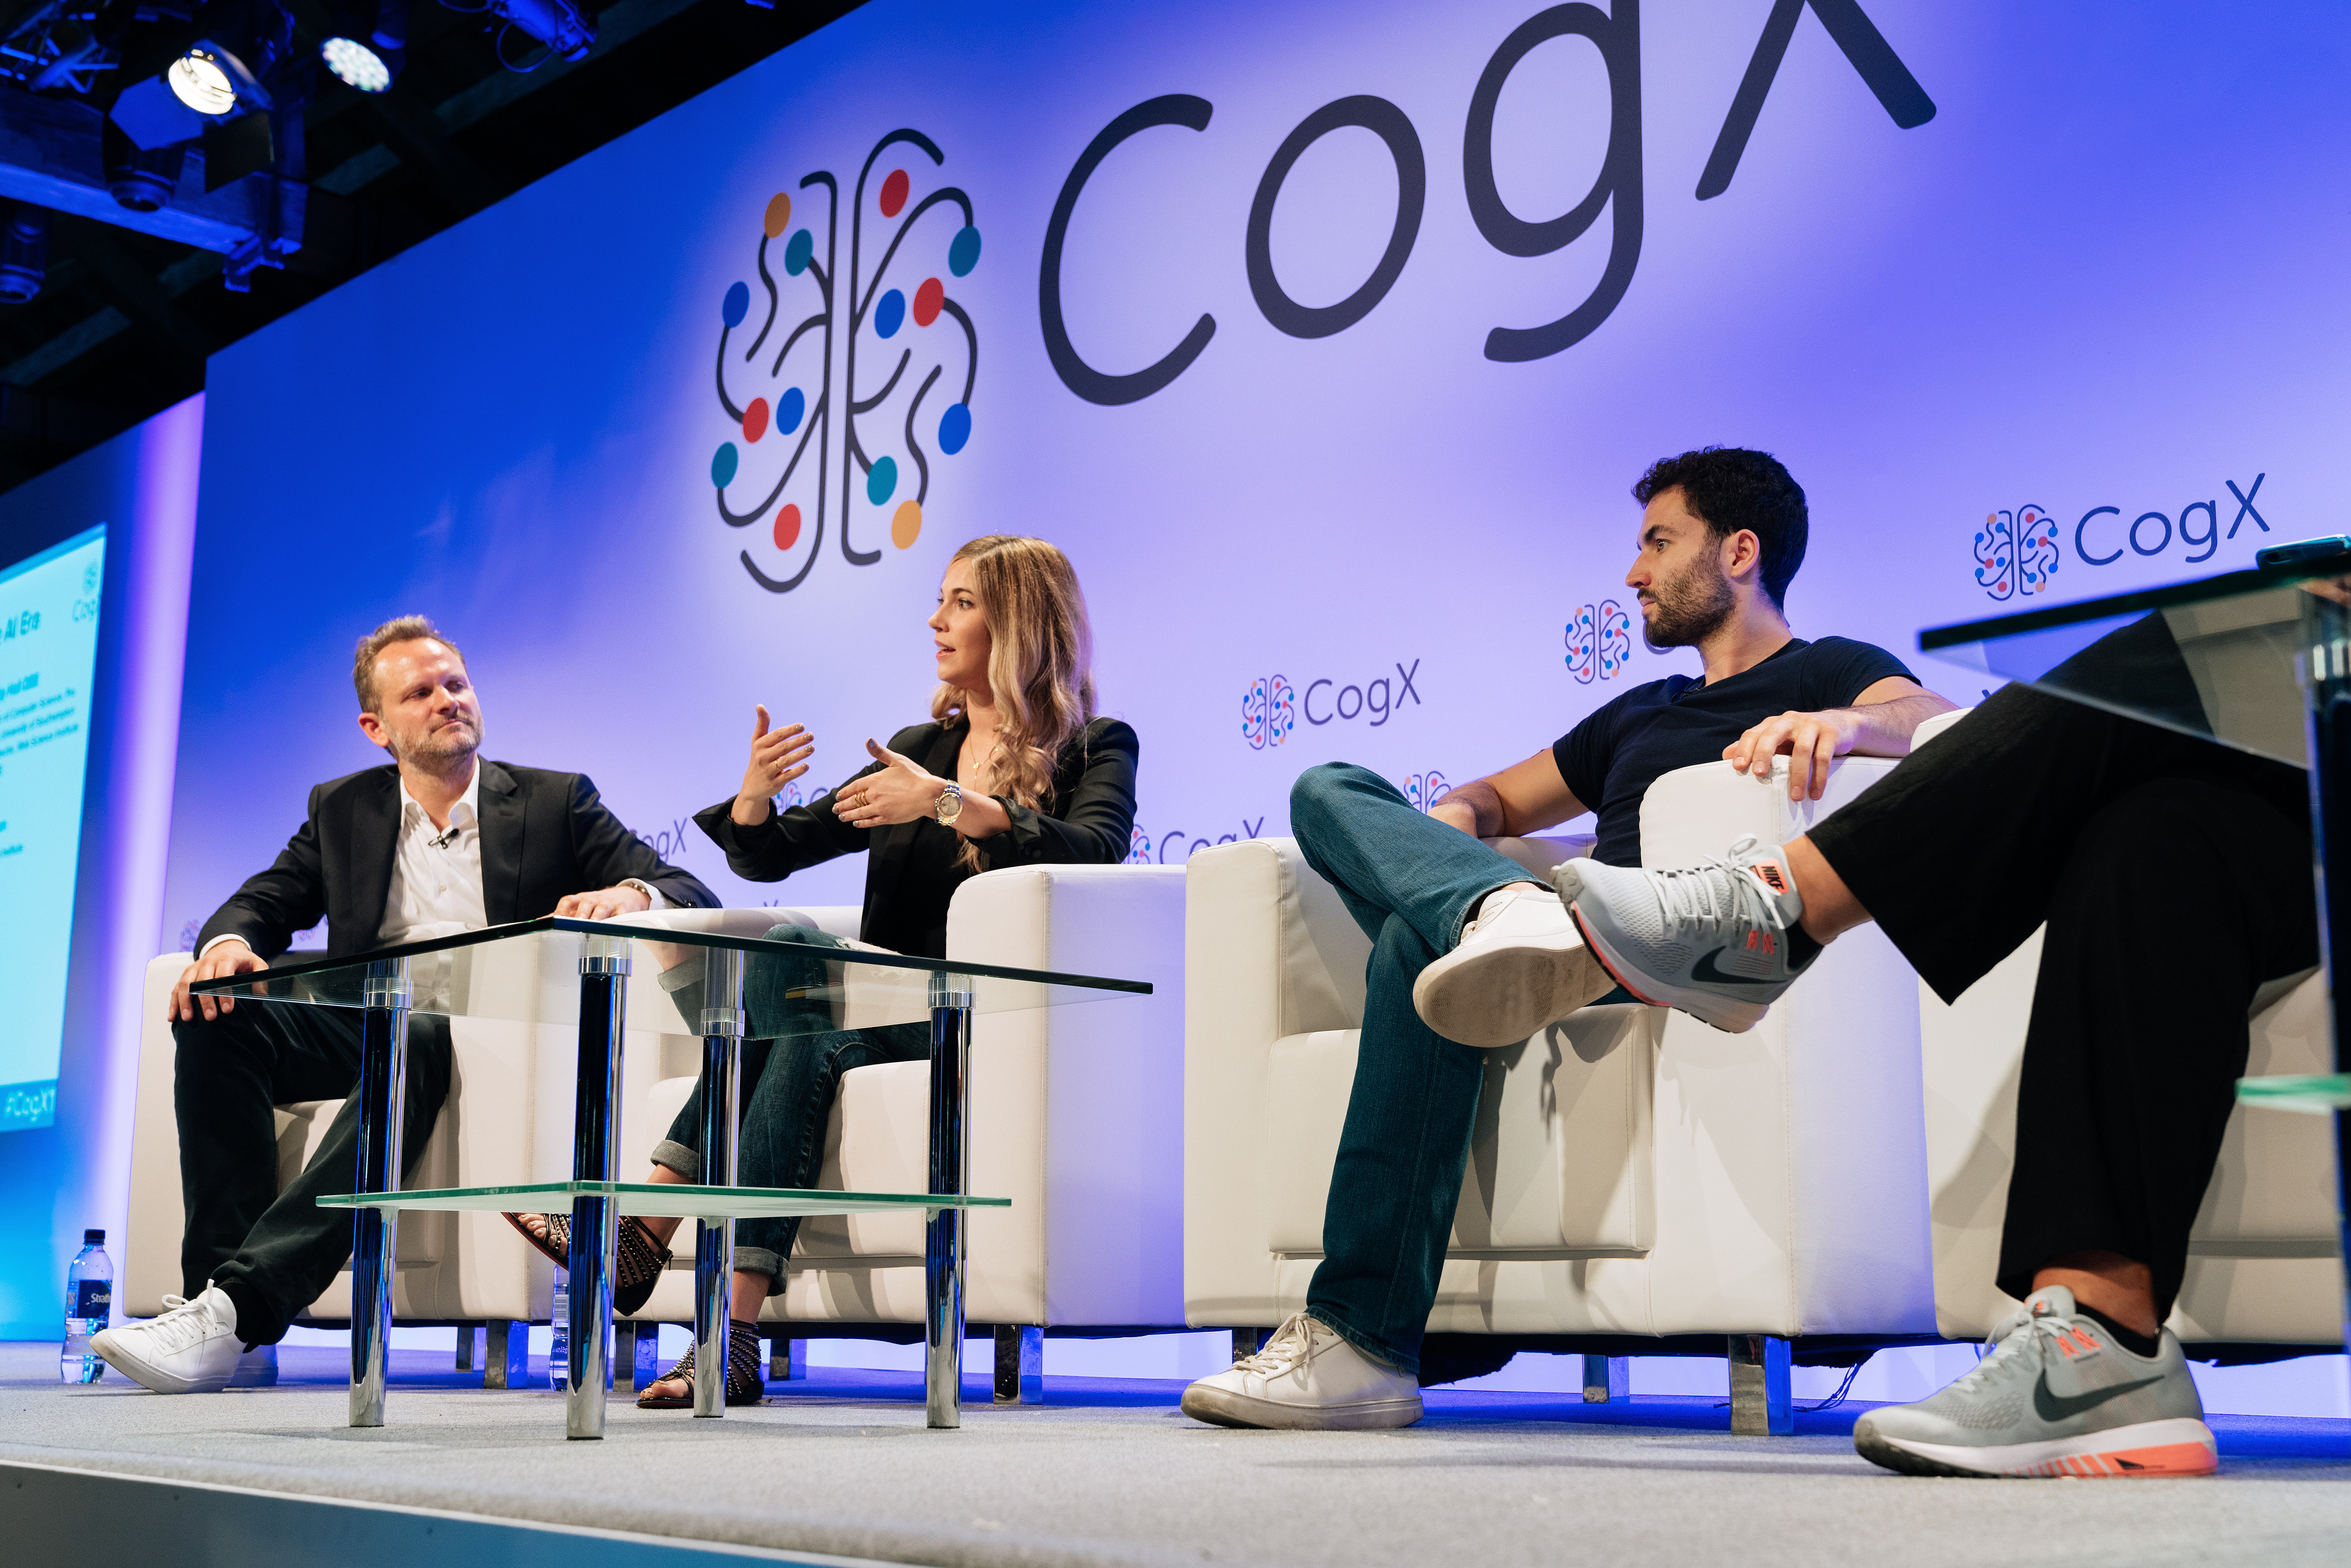 PreparationTech at 2021 CogX Festival